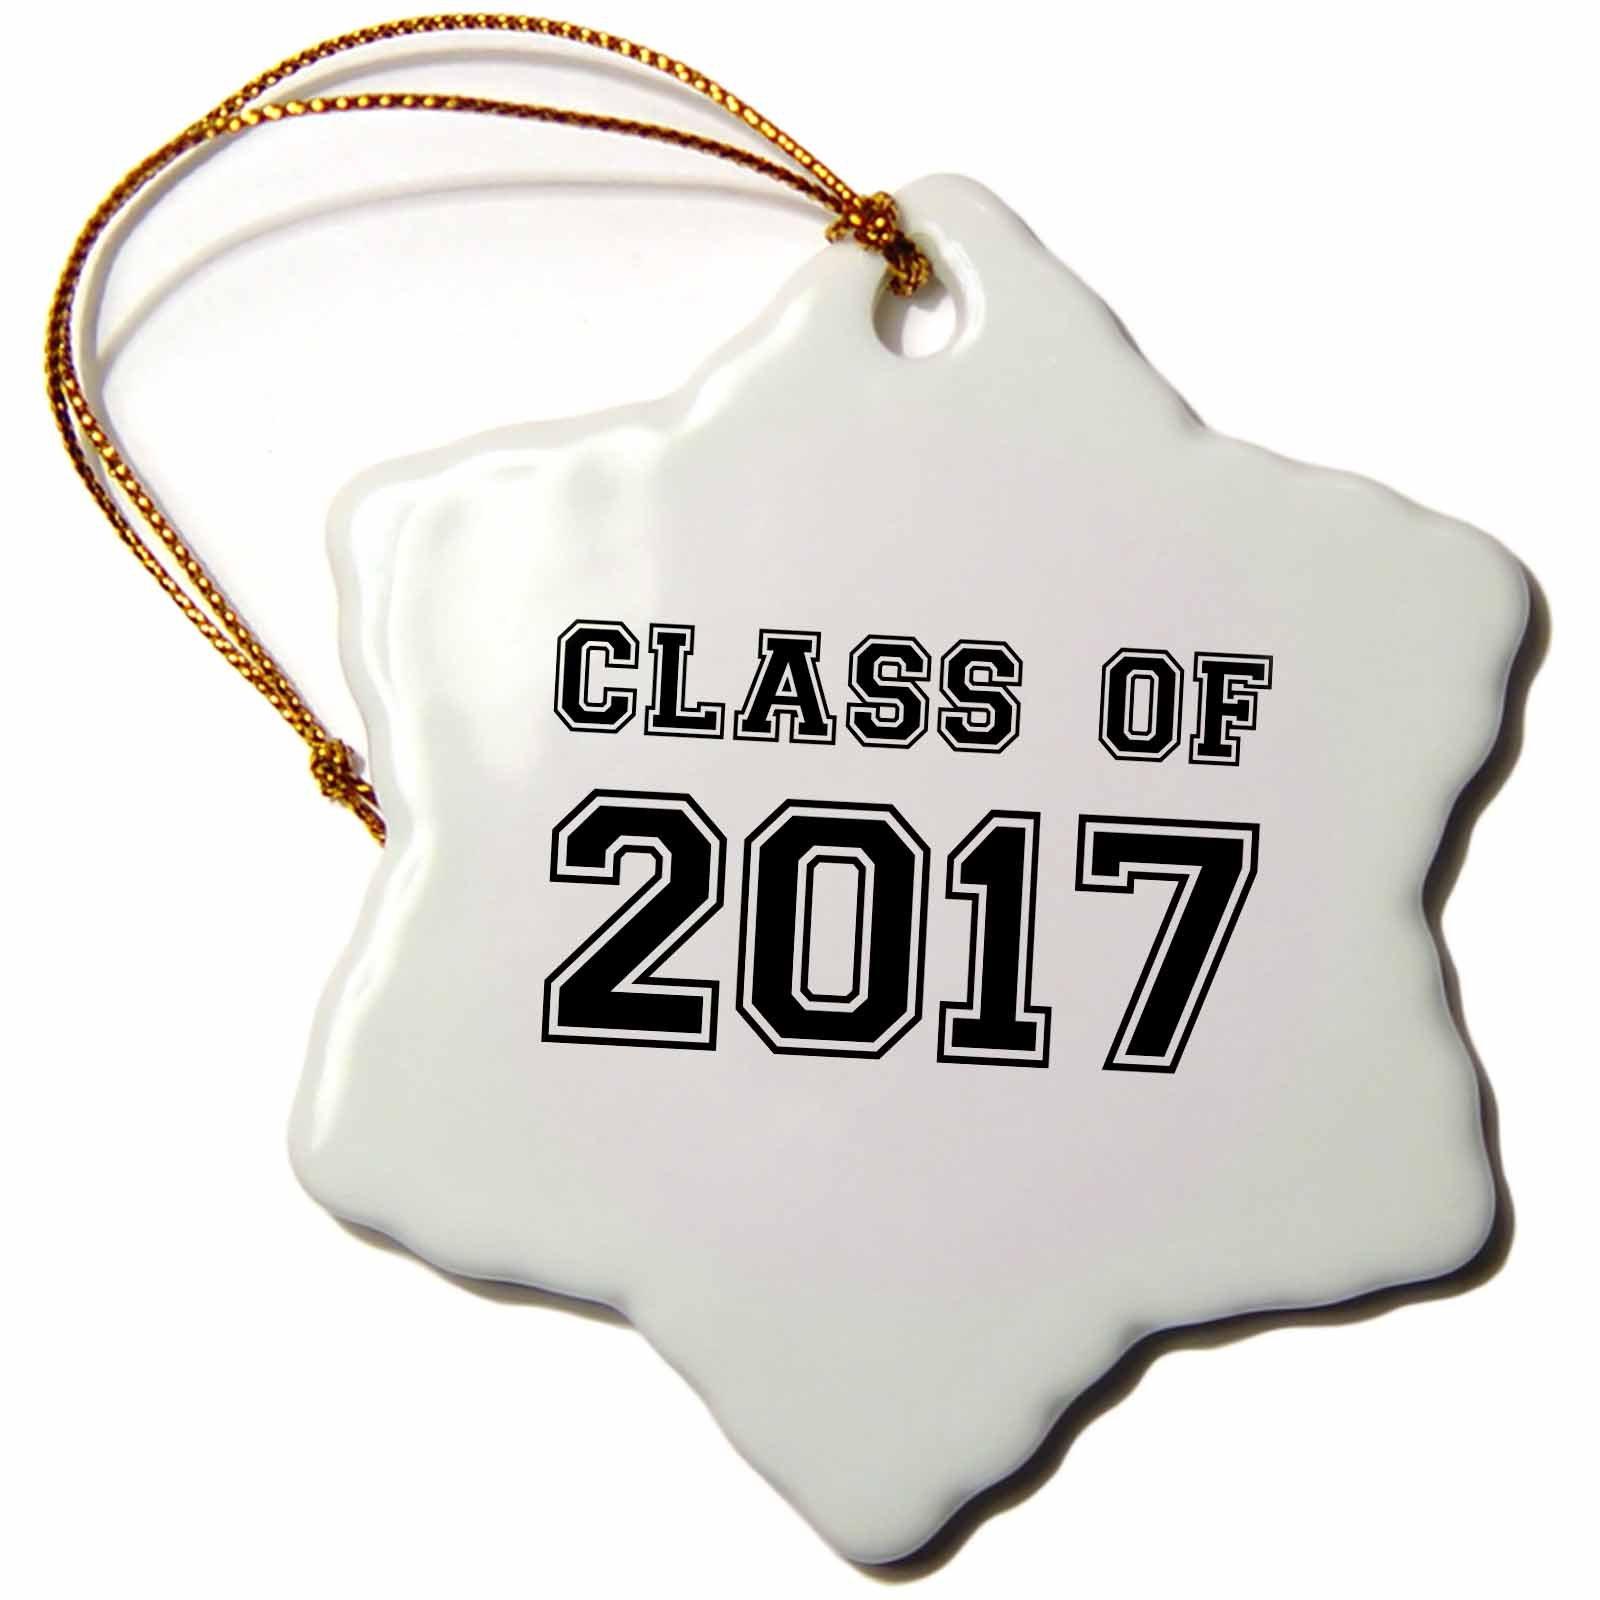 3dRose InspirationzStore Typography - Class of 2017 - Graduation gift - graduate graduating high school university or college grad black - 3 inch Snowflake Porcelain Ornament (orn_162668_1)